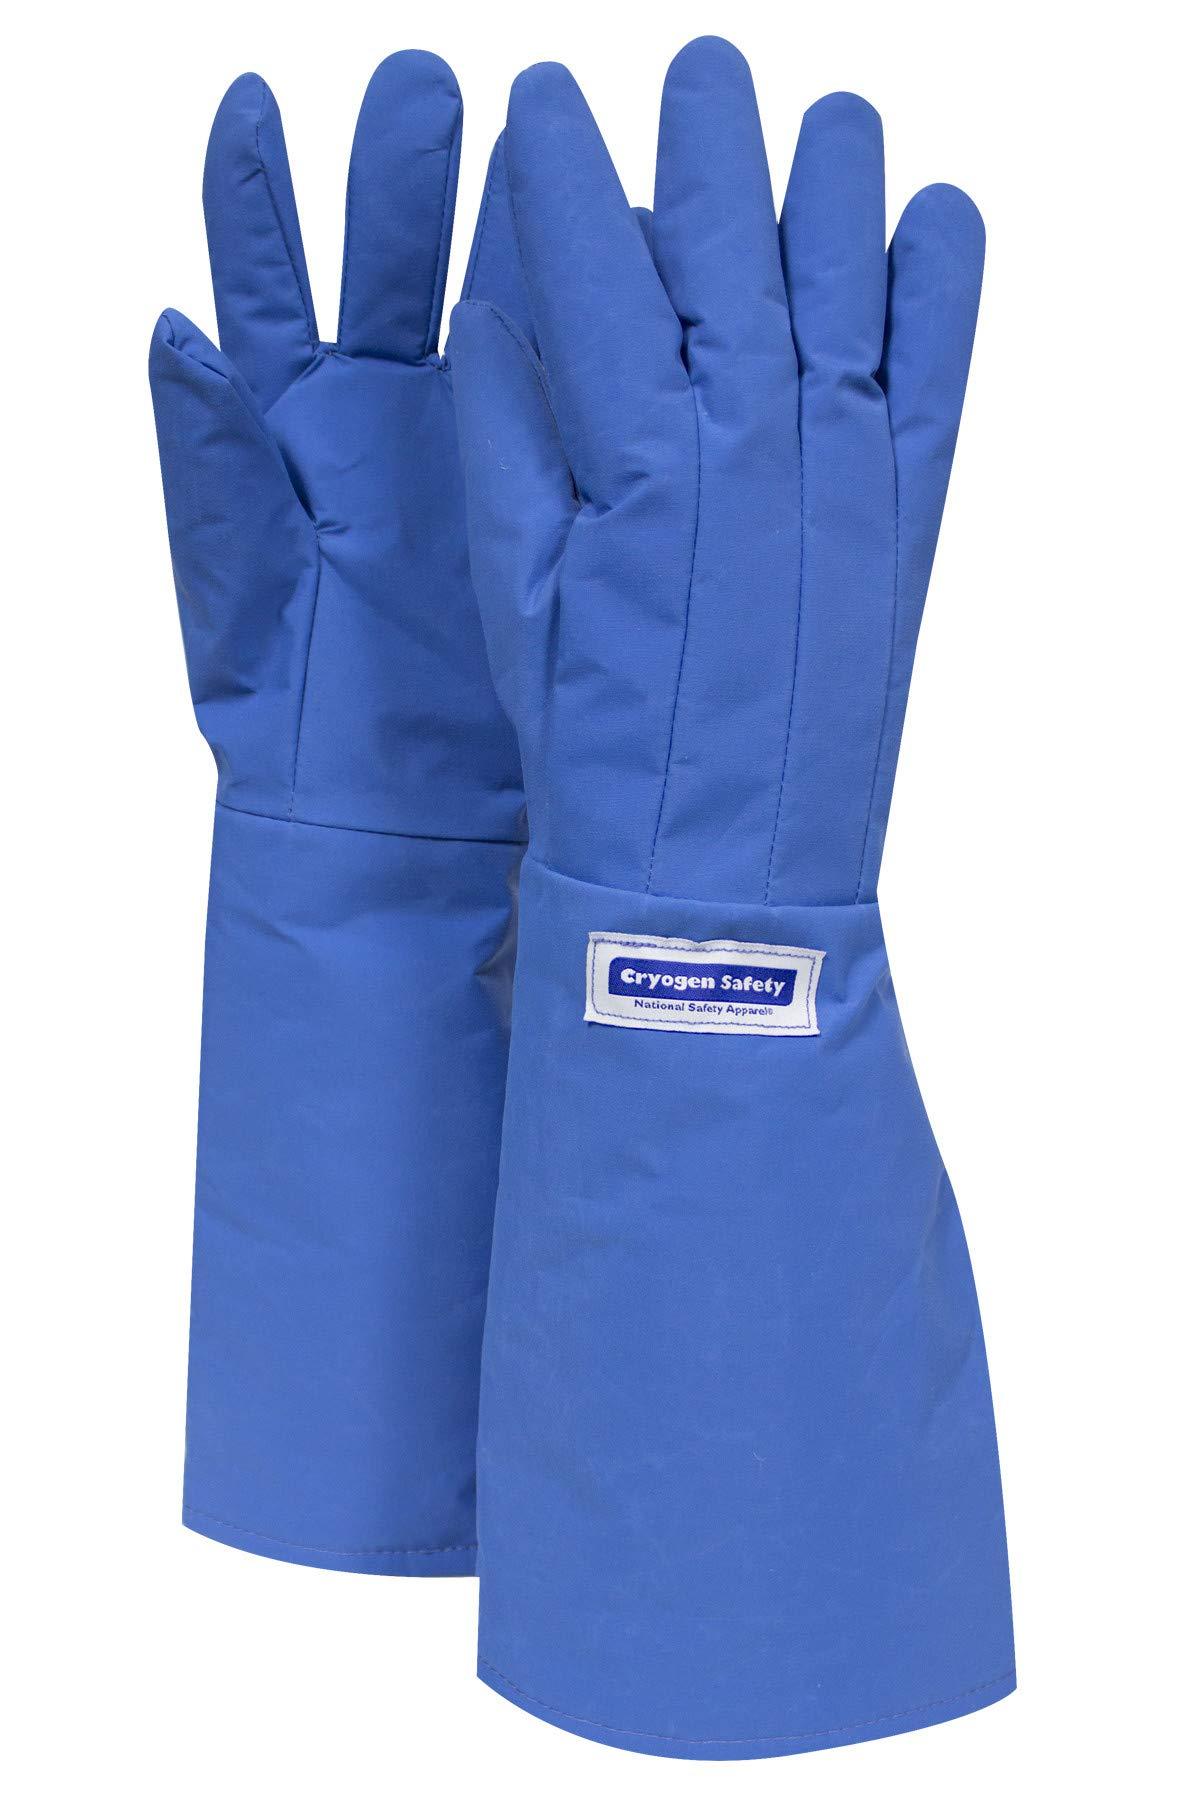 National Safety Apparel G99CRBERMDEL Nylon Taslan and PTFE Elbow Standard Water Resistant Safety Glove, Cryogenic, 17'' - 18'' Length, Medium, Blue